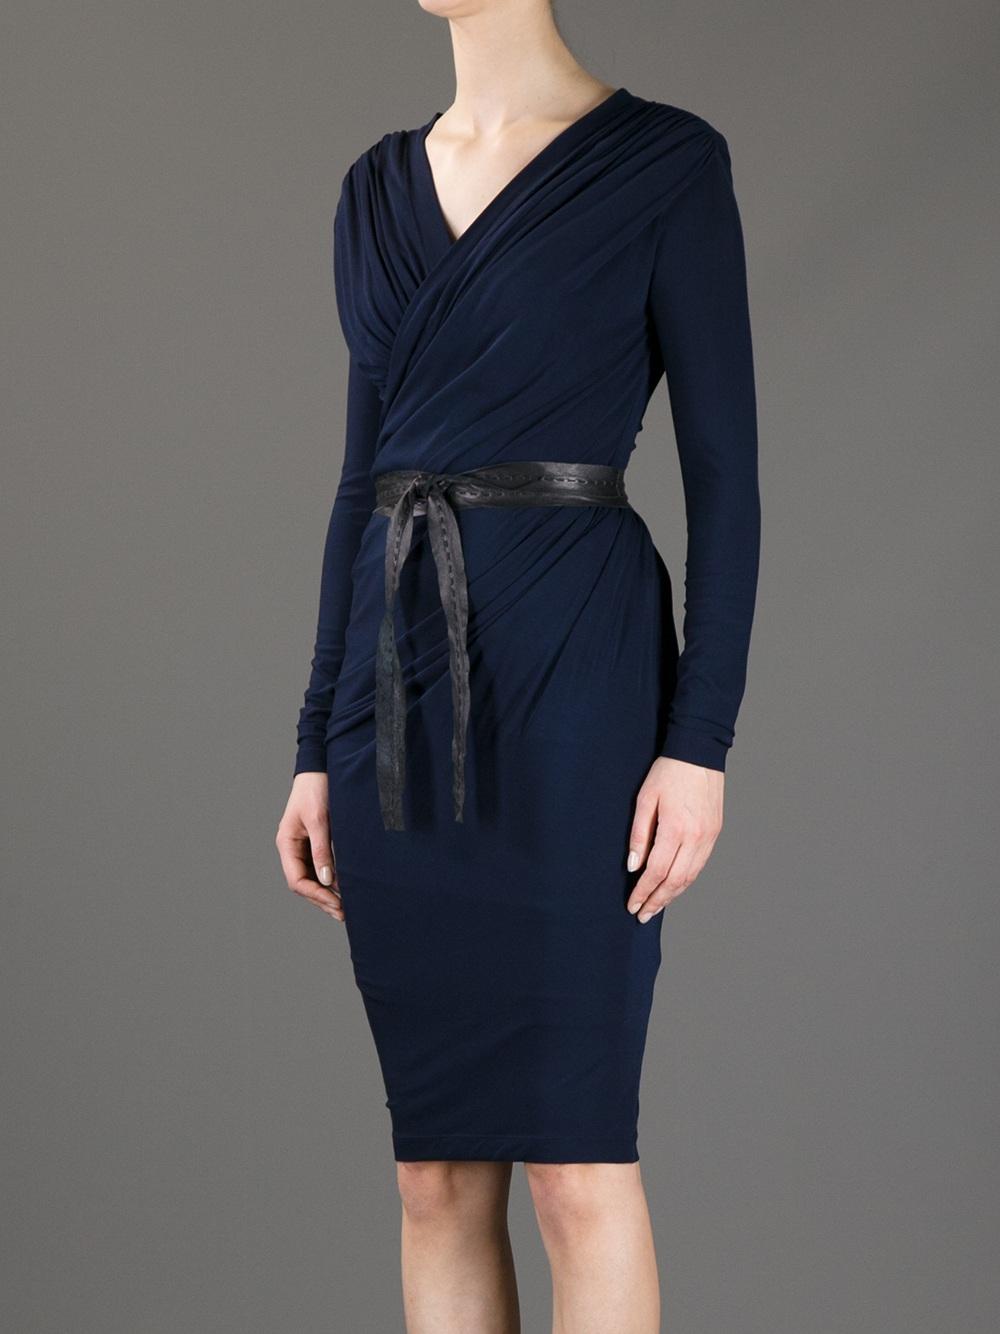 Lyst  Donna Karan Belted Wrap Dress in Blue